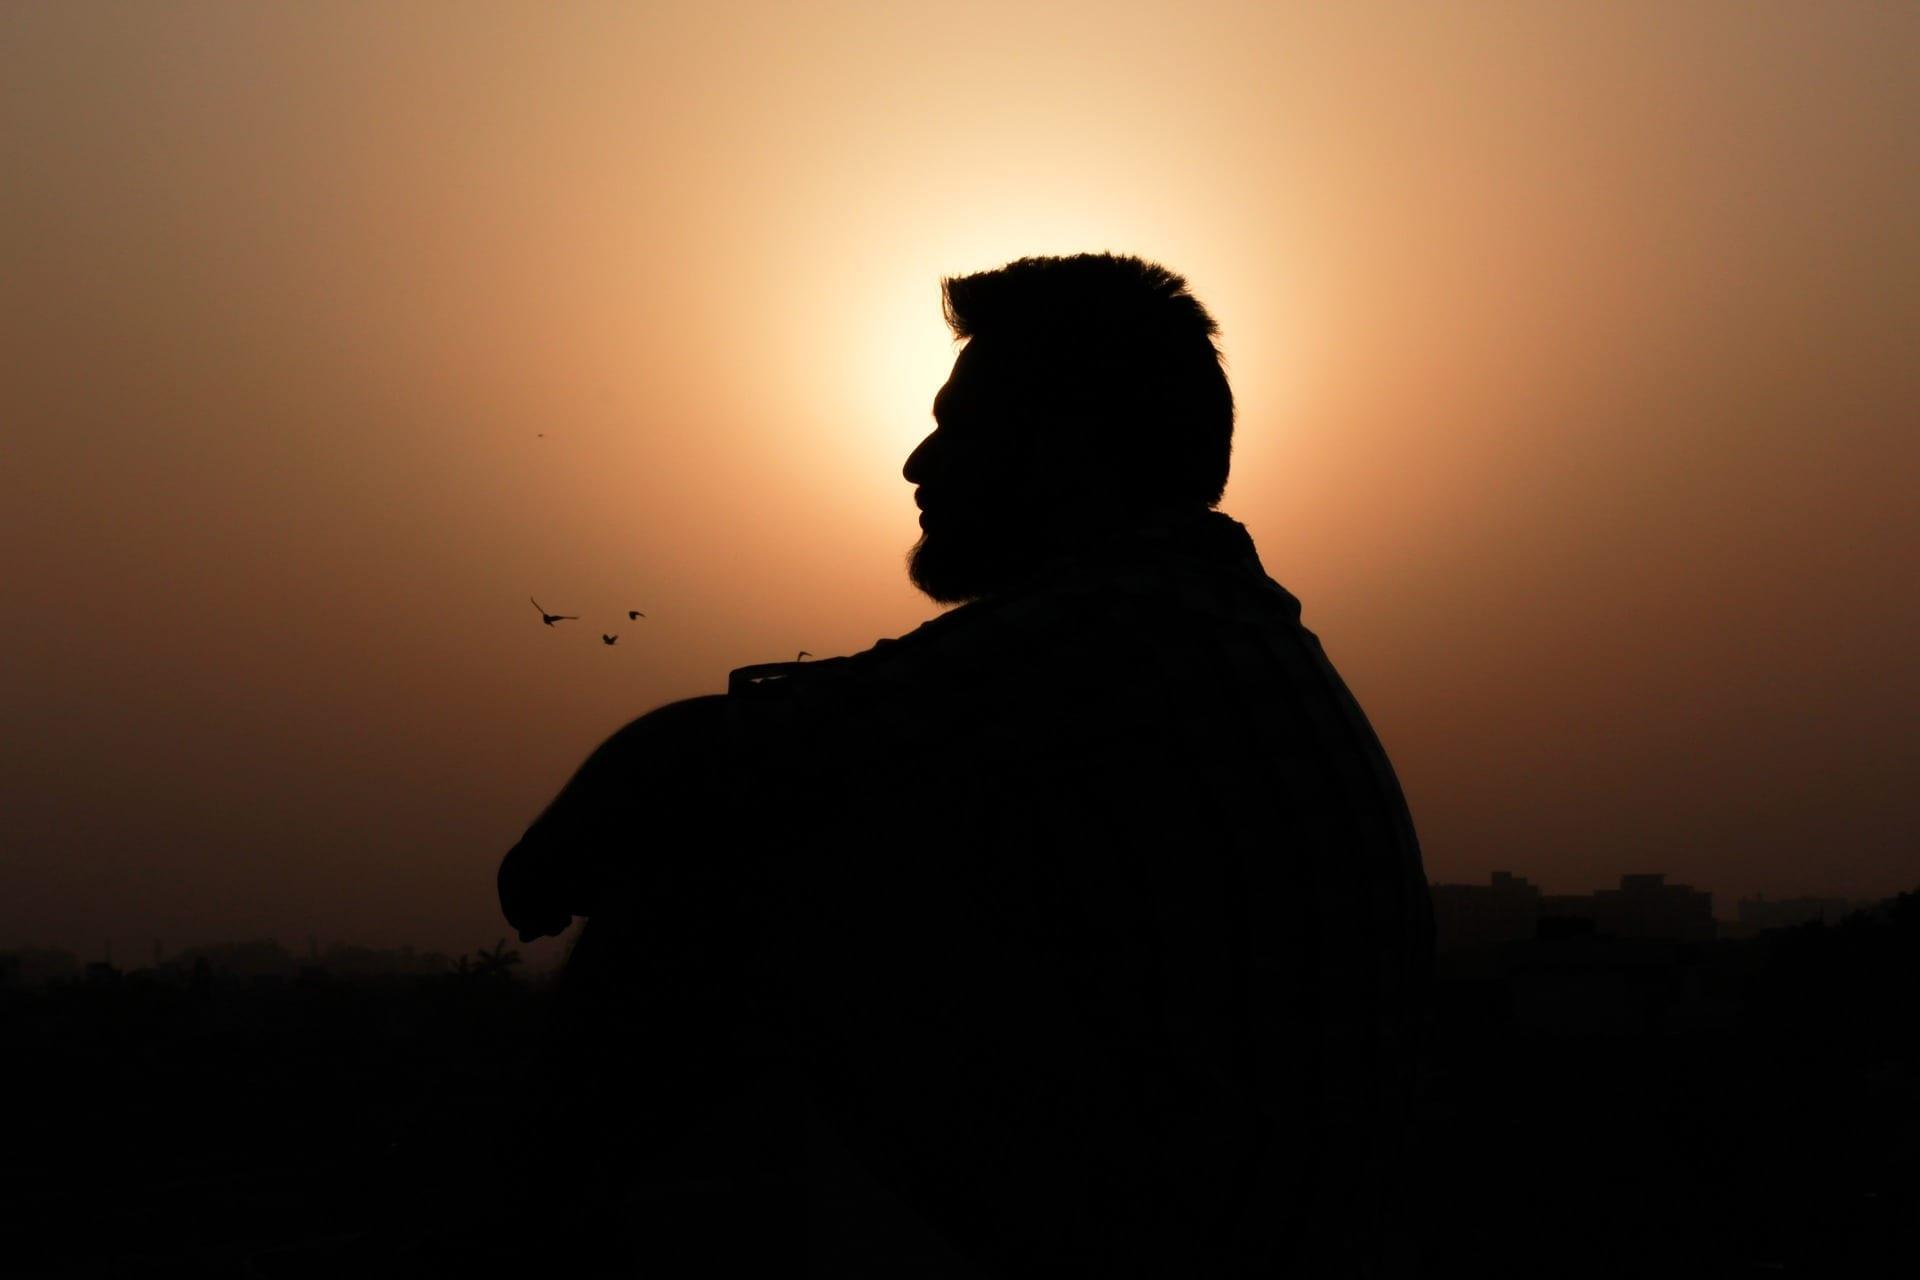 Silhouette of a man alone; image by minalsingla104, via Pixabay, CC0.